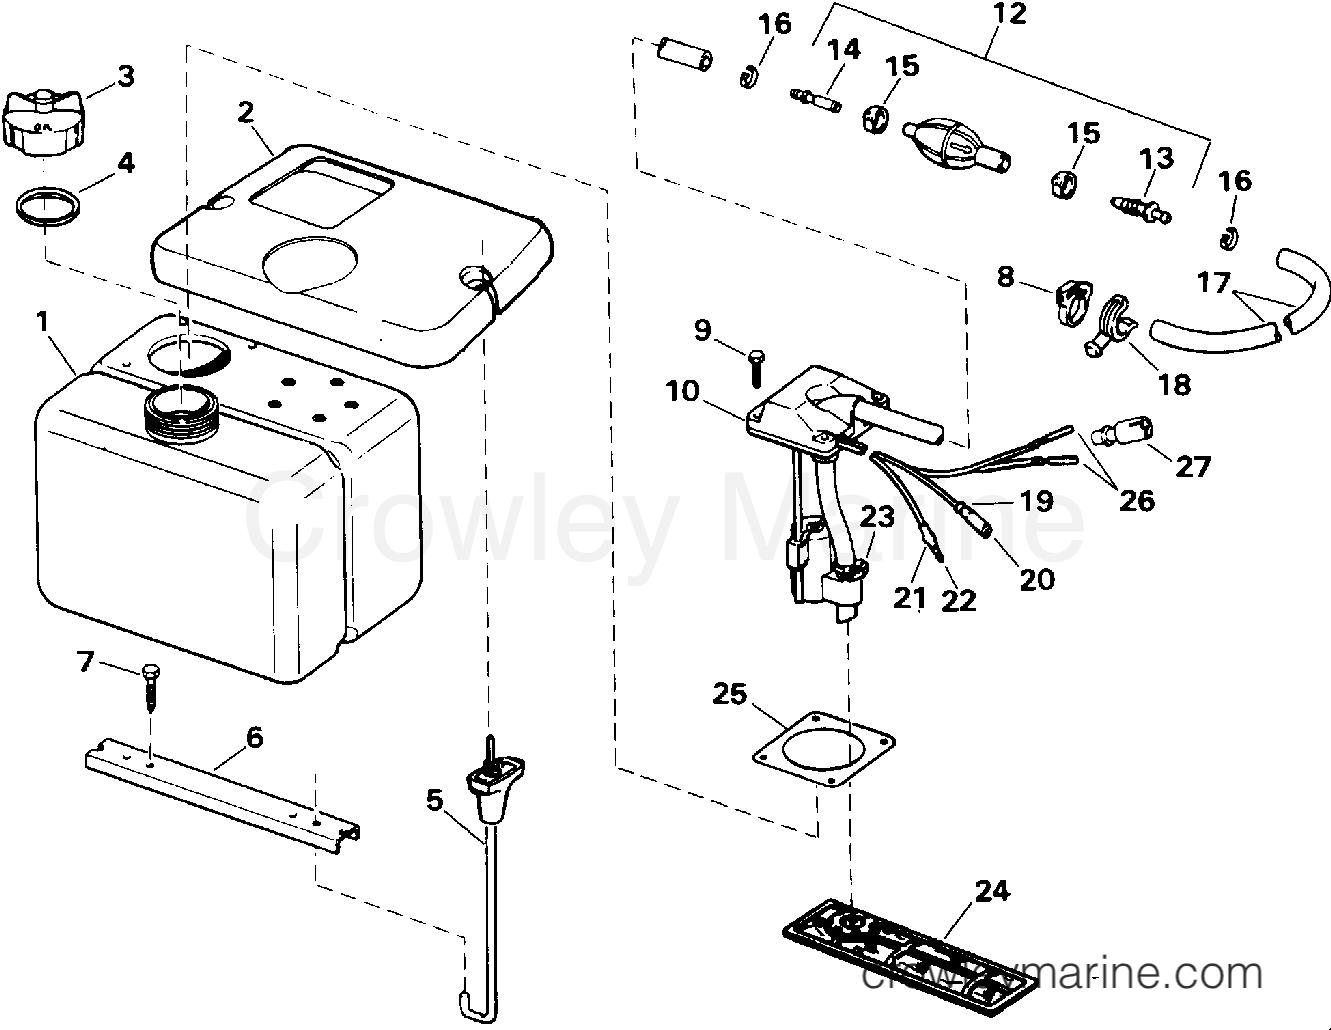 Oil Tank Kit